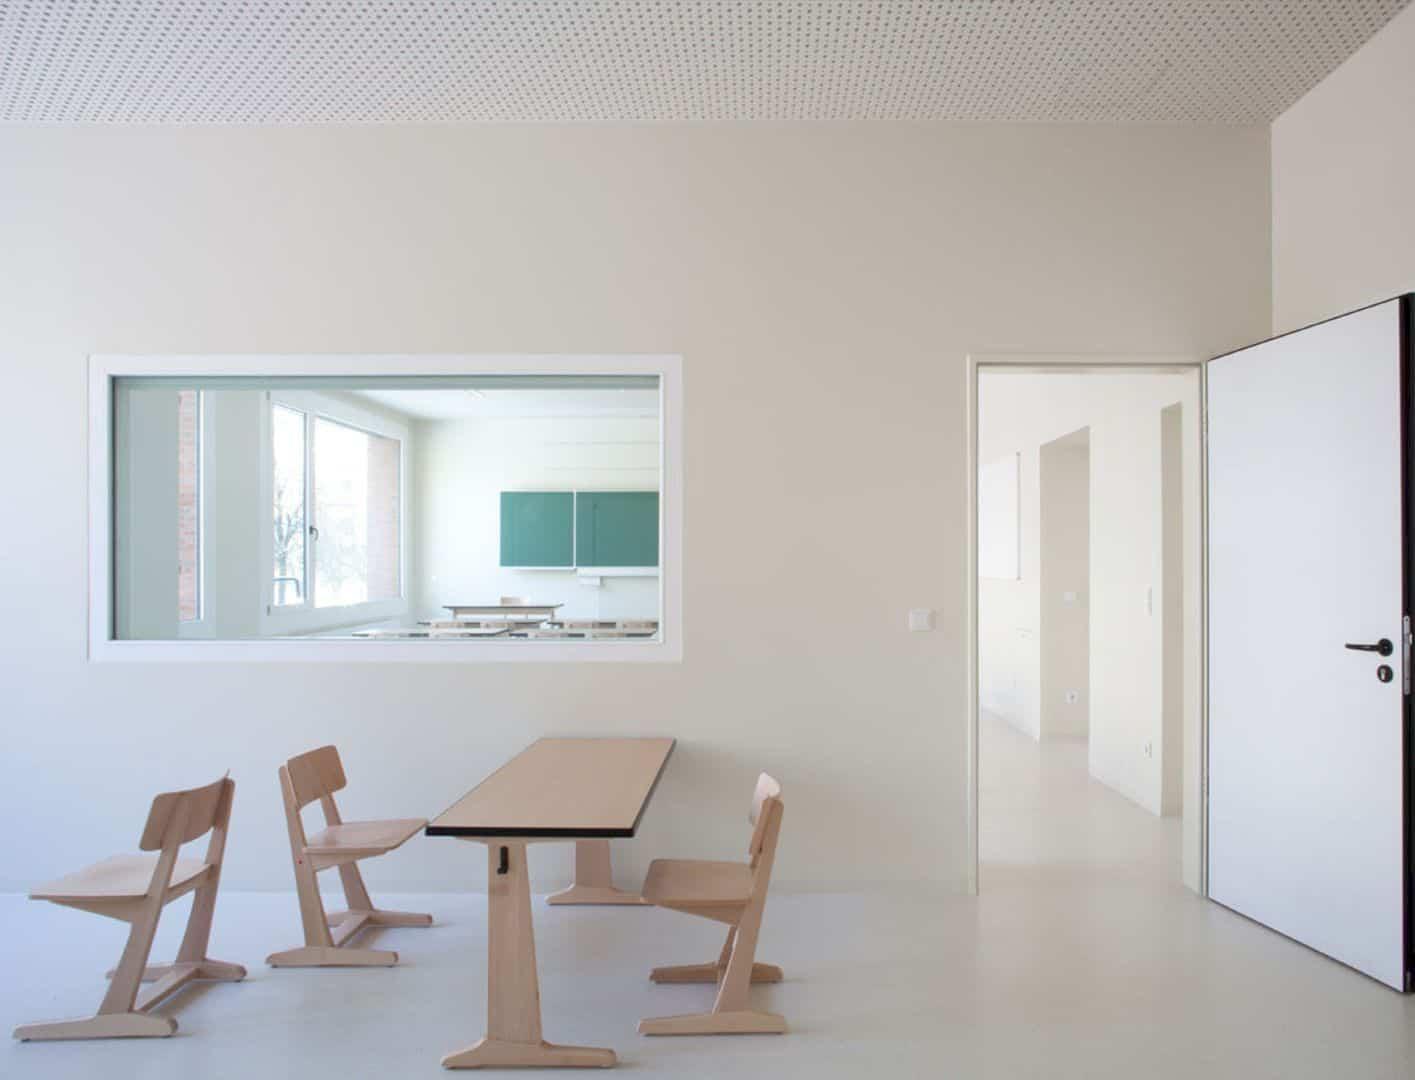 Ludwig Hoffmann Primary School By AFF Architekten 2